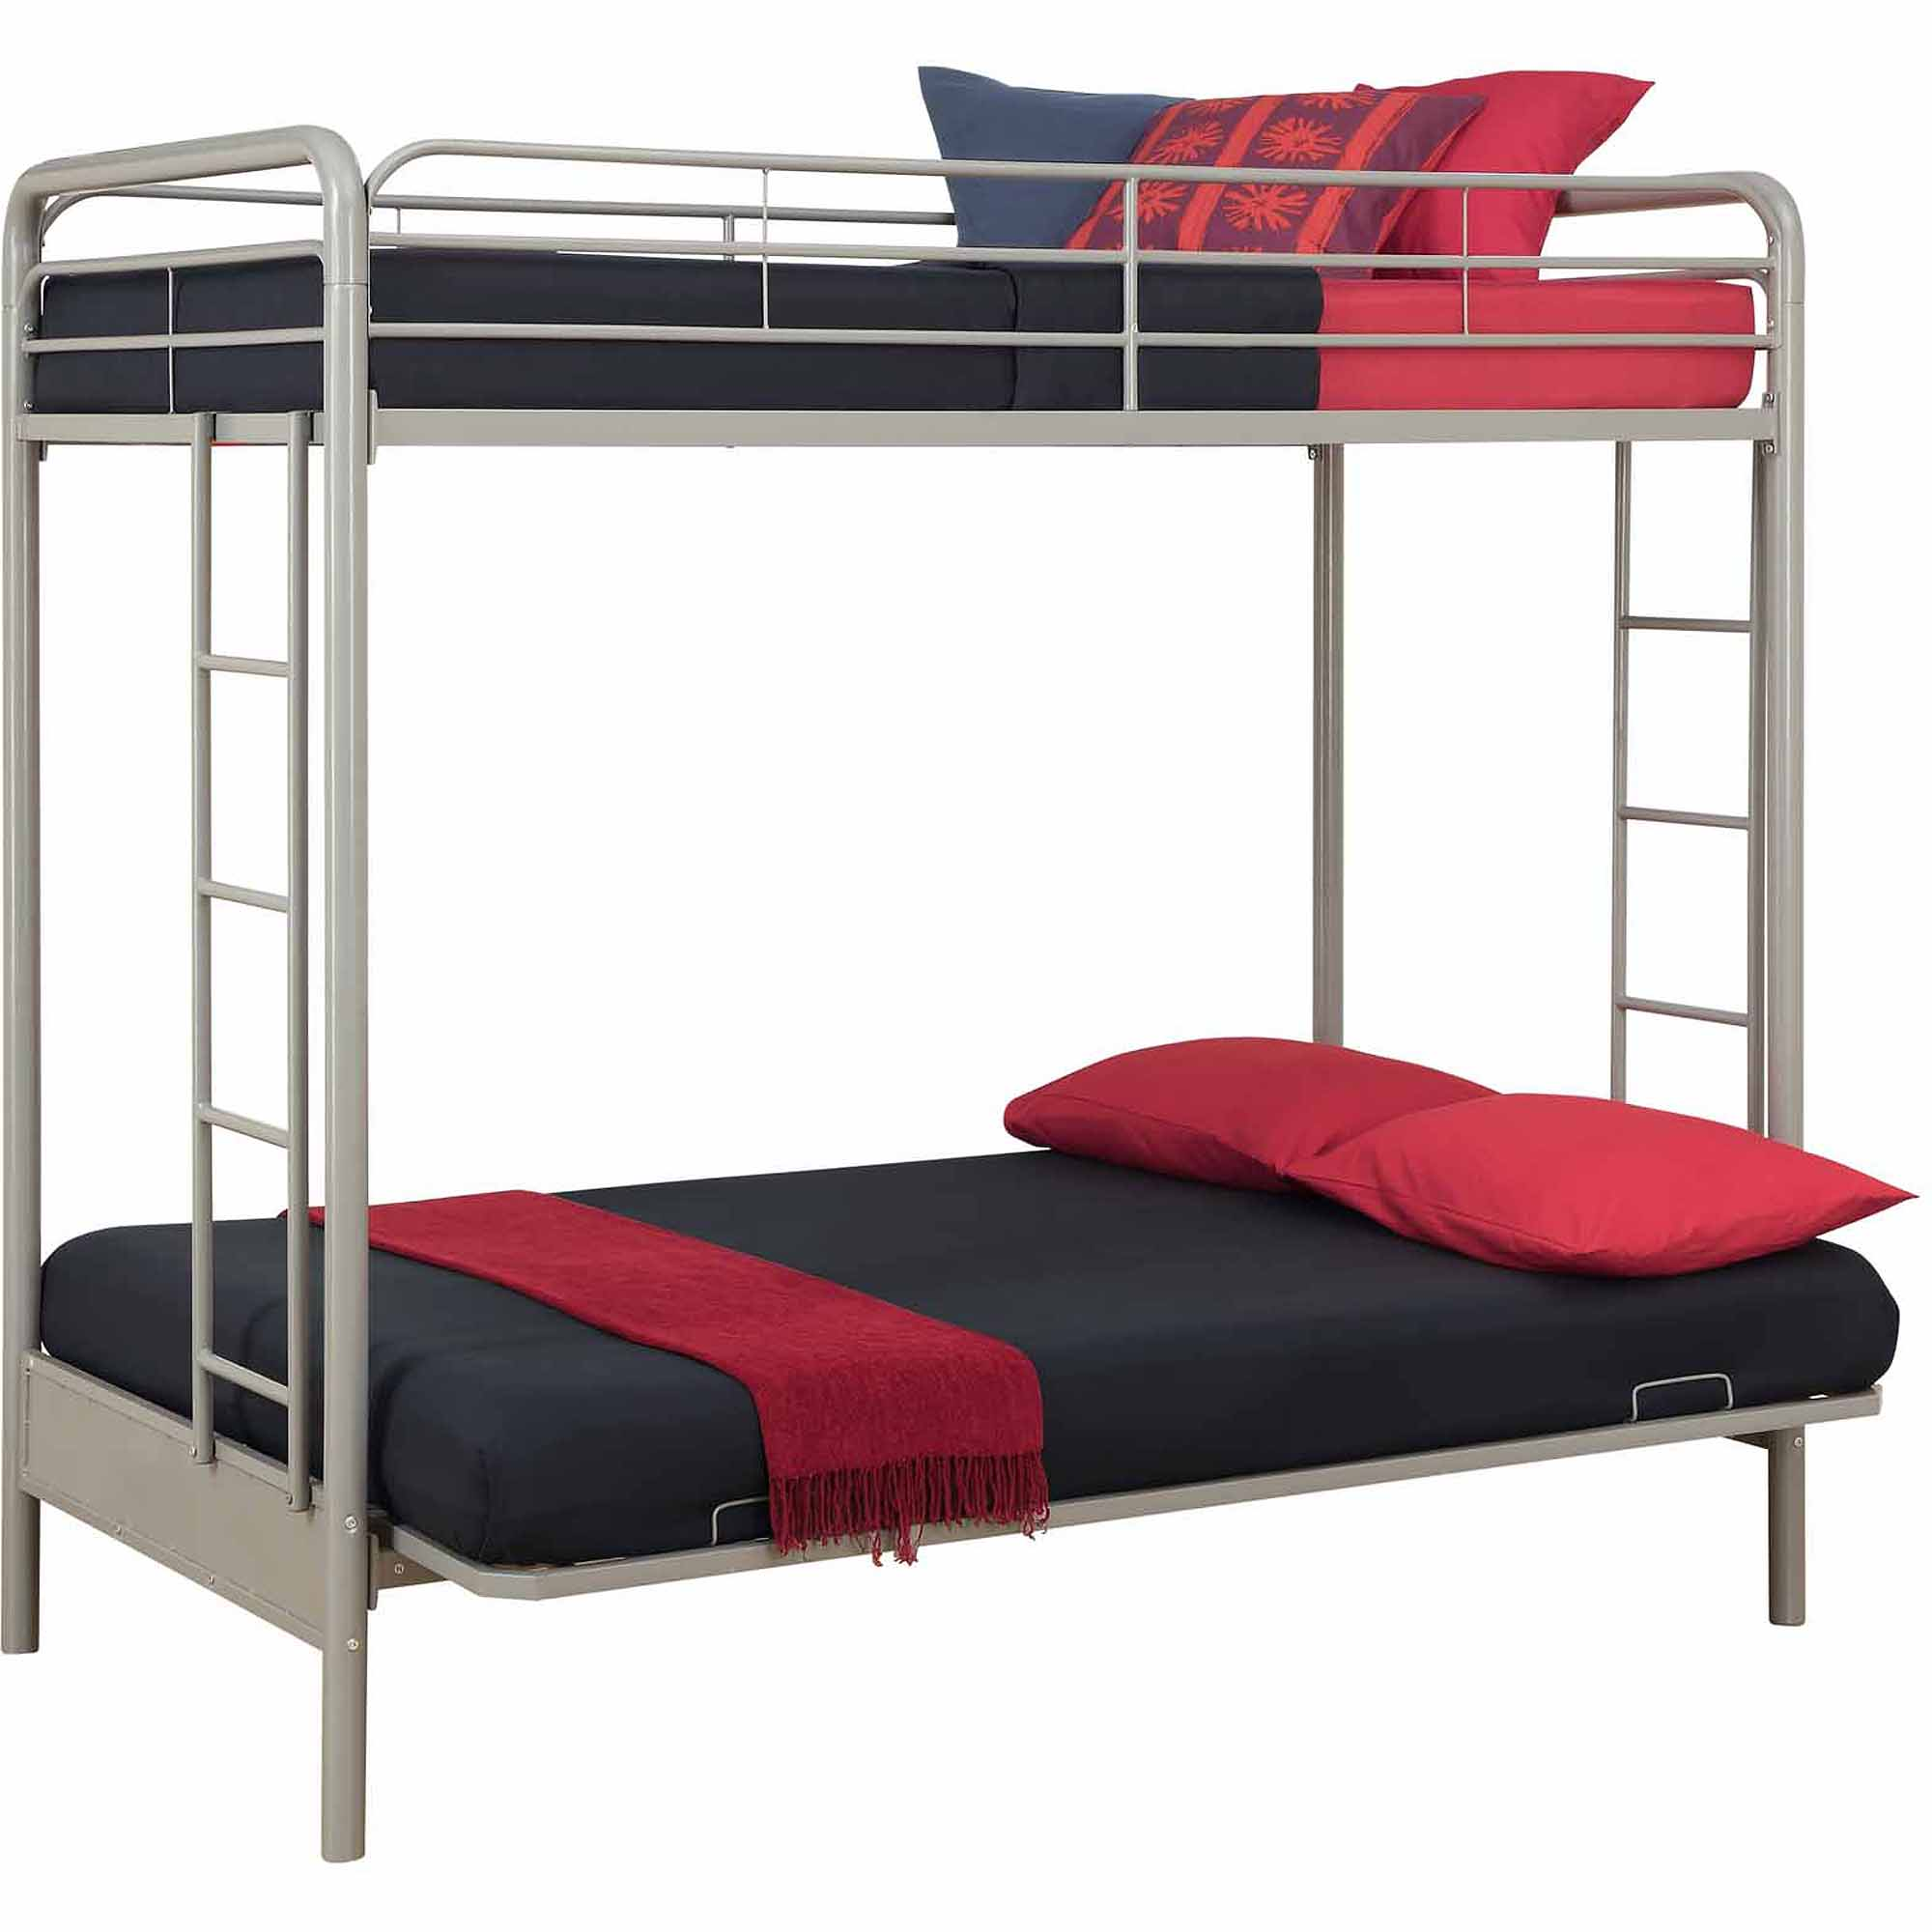 in more futon furniture amp dallas chambres buy antonio tx comfortable less most futons bisou san mattress